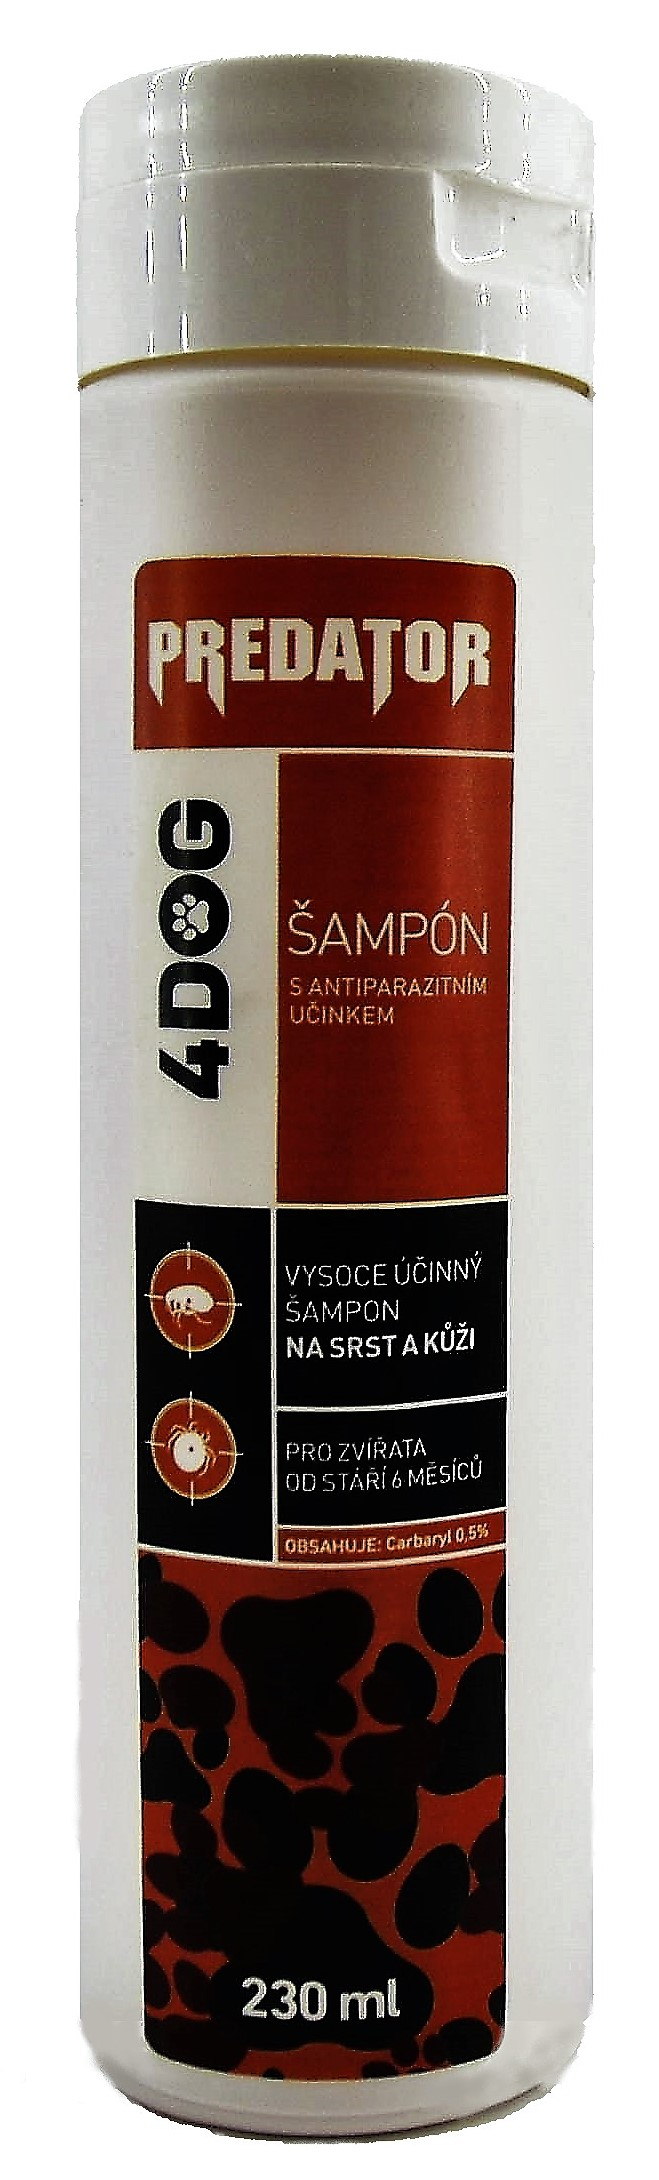 Predator šampon 4DOG 250 ml